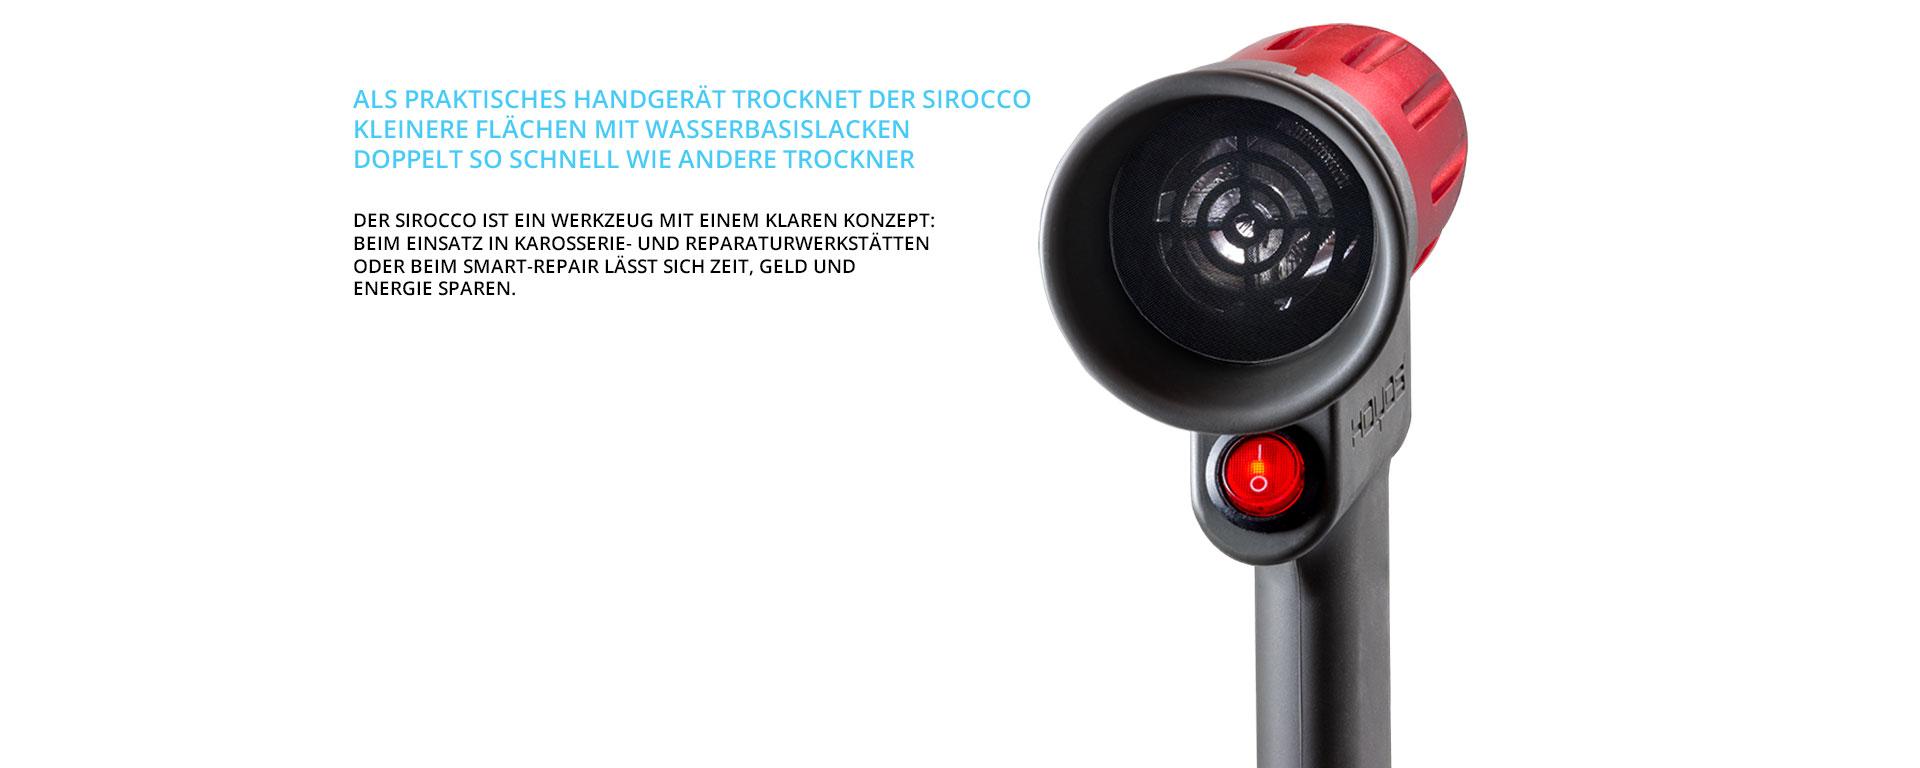 Sirocco-lacktrockner